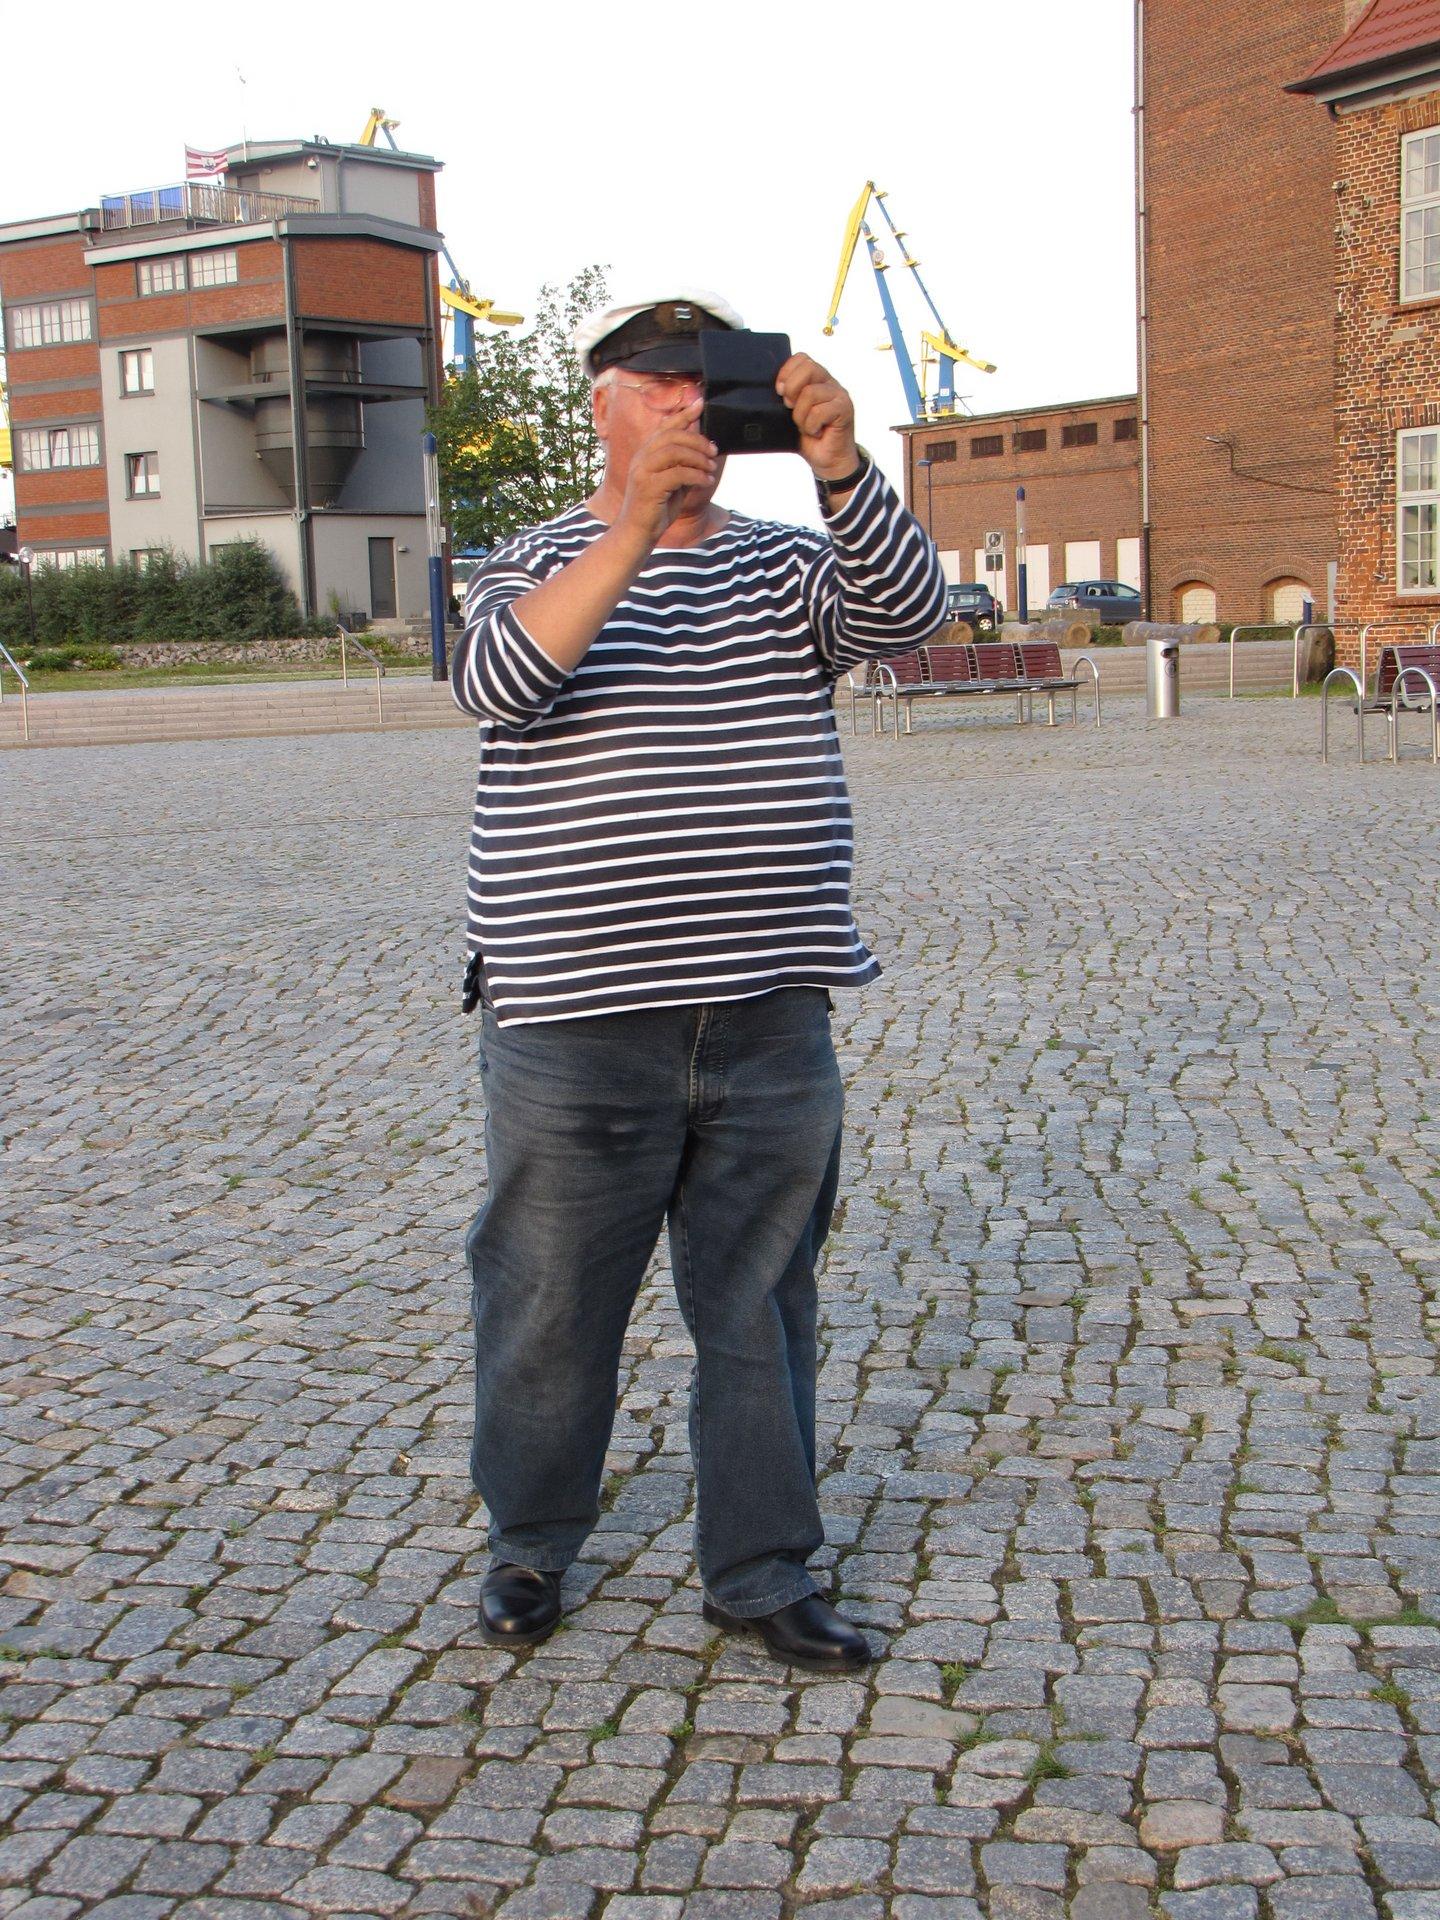 28-2011-08-26_WismarOT_92